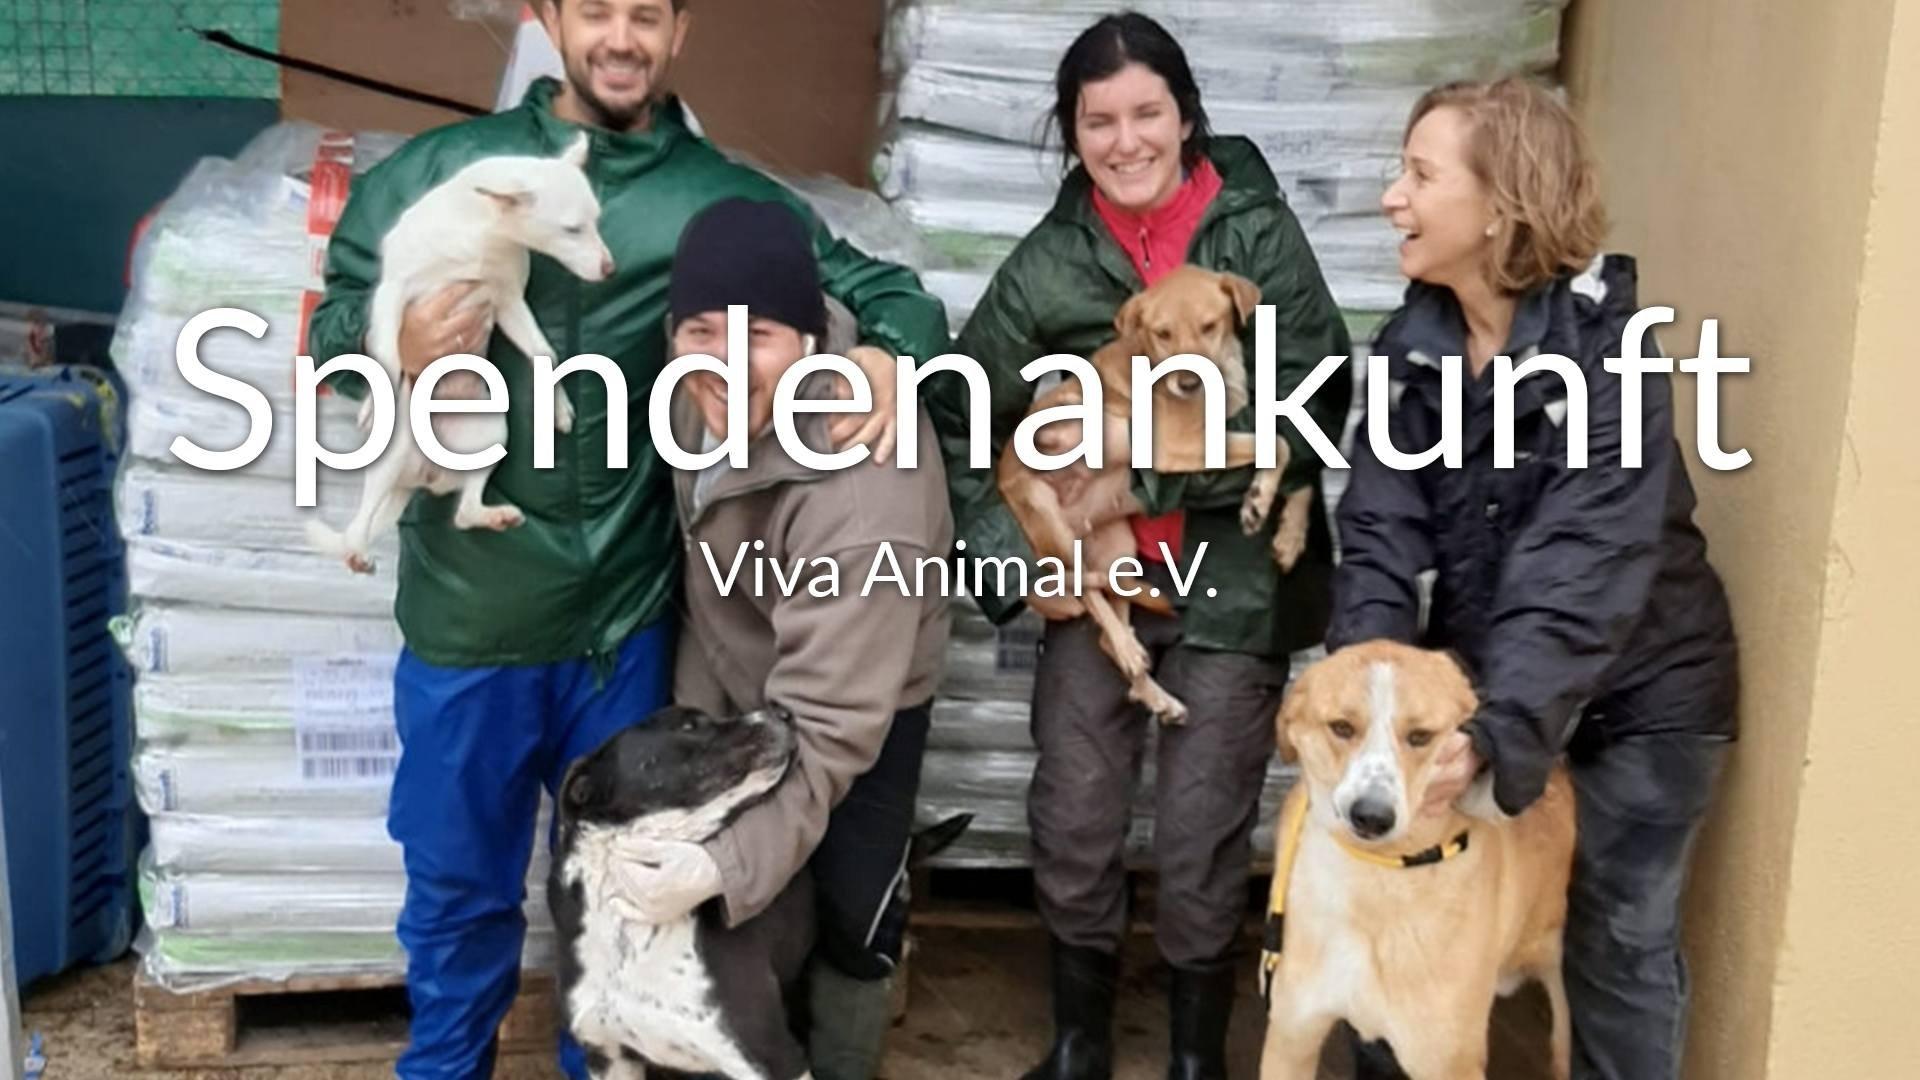 Viva-Animal e.V.-Futterspendenankunft-januar-2020-WL-Spanien-VIDEO